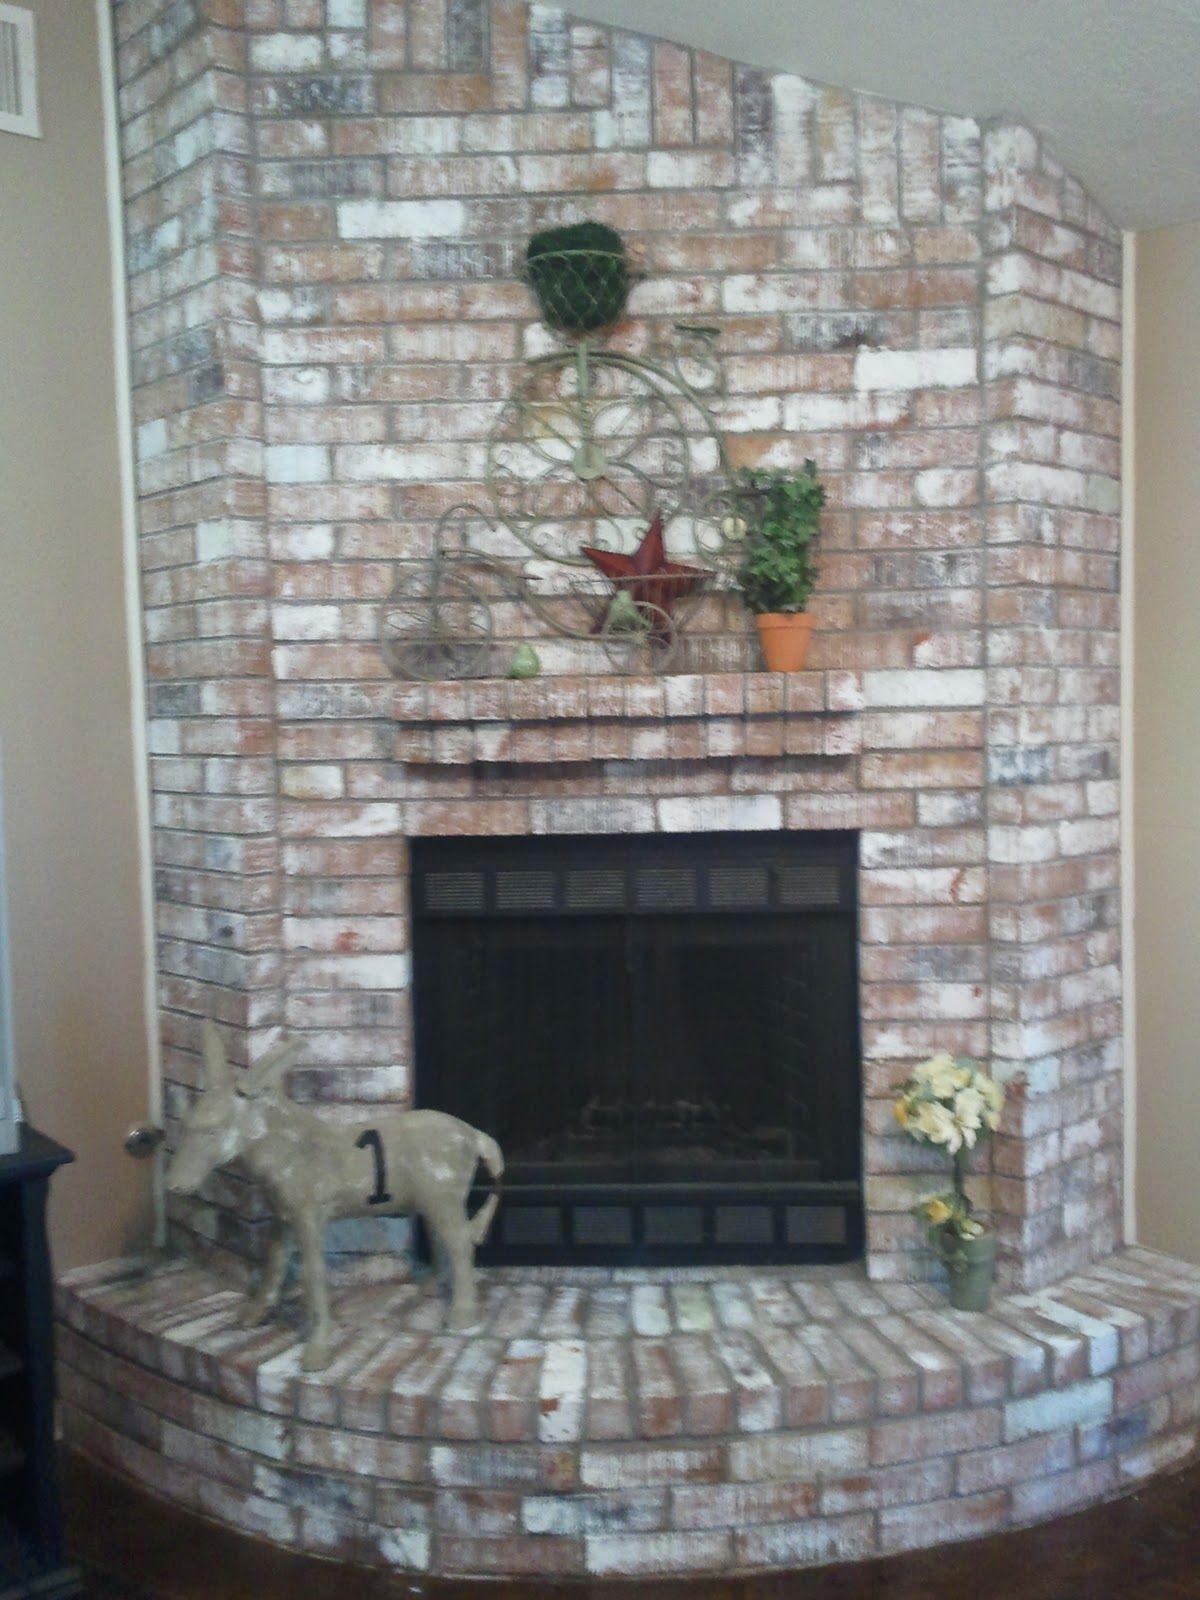 Fireplace7 Jpg 1 200 215 1 600 Pixels Brick Fireplace